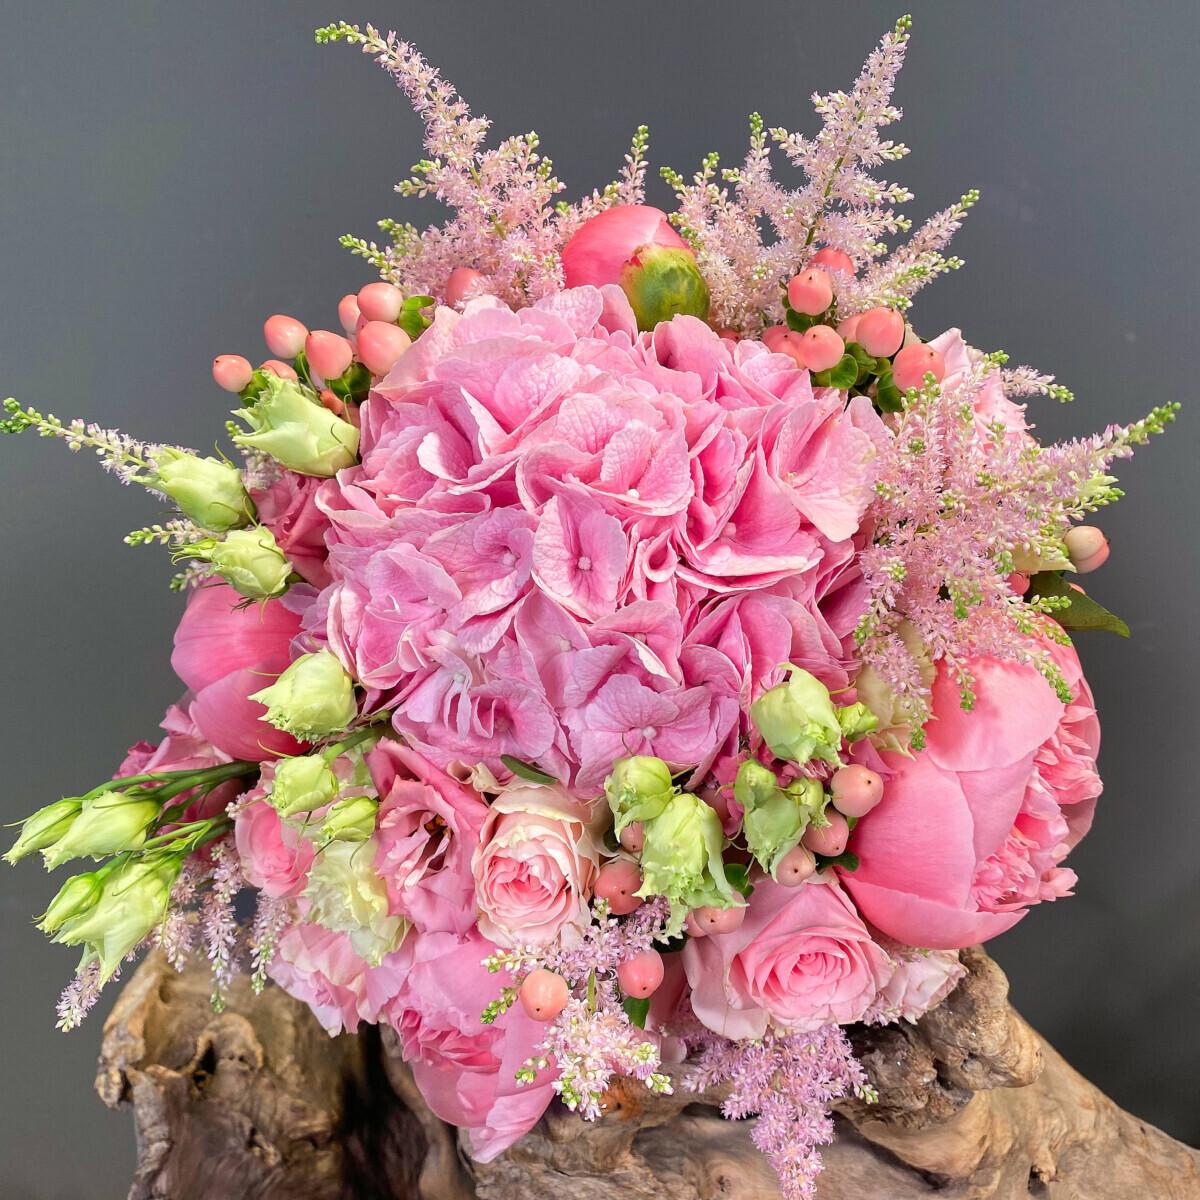 Bridal Bouquet Pink Astilbe Roses Peonies Hydrangeas